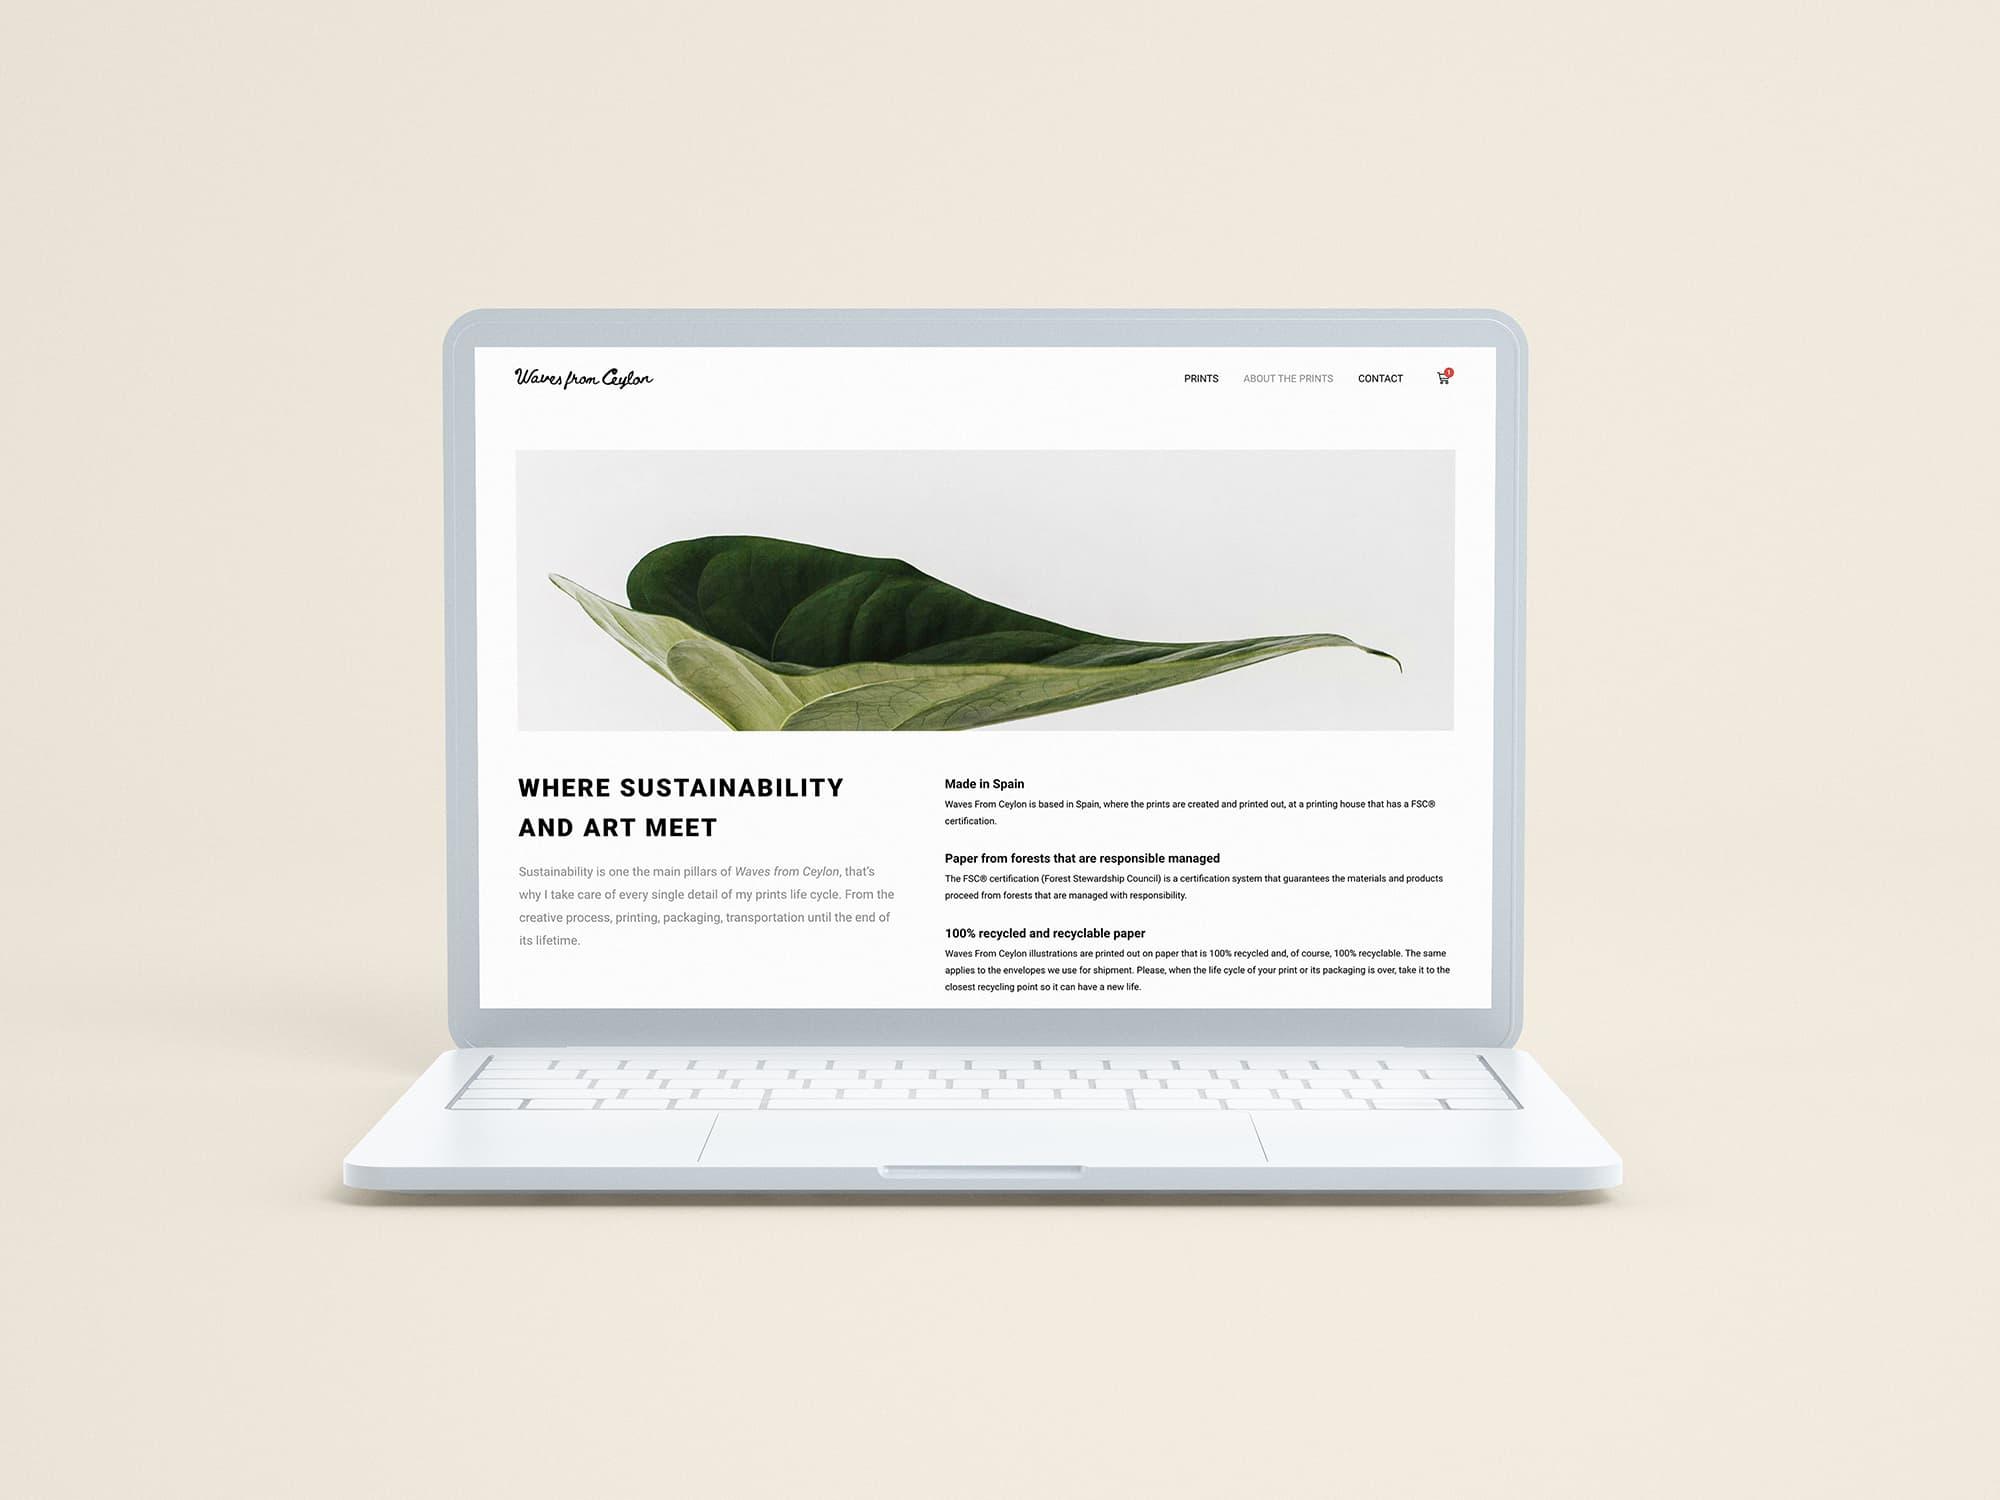 Diseño web Waves from Ceylon